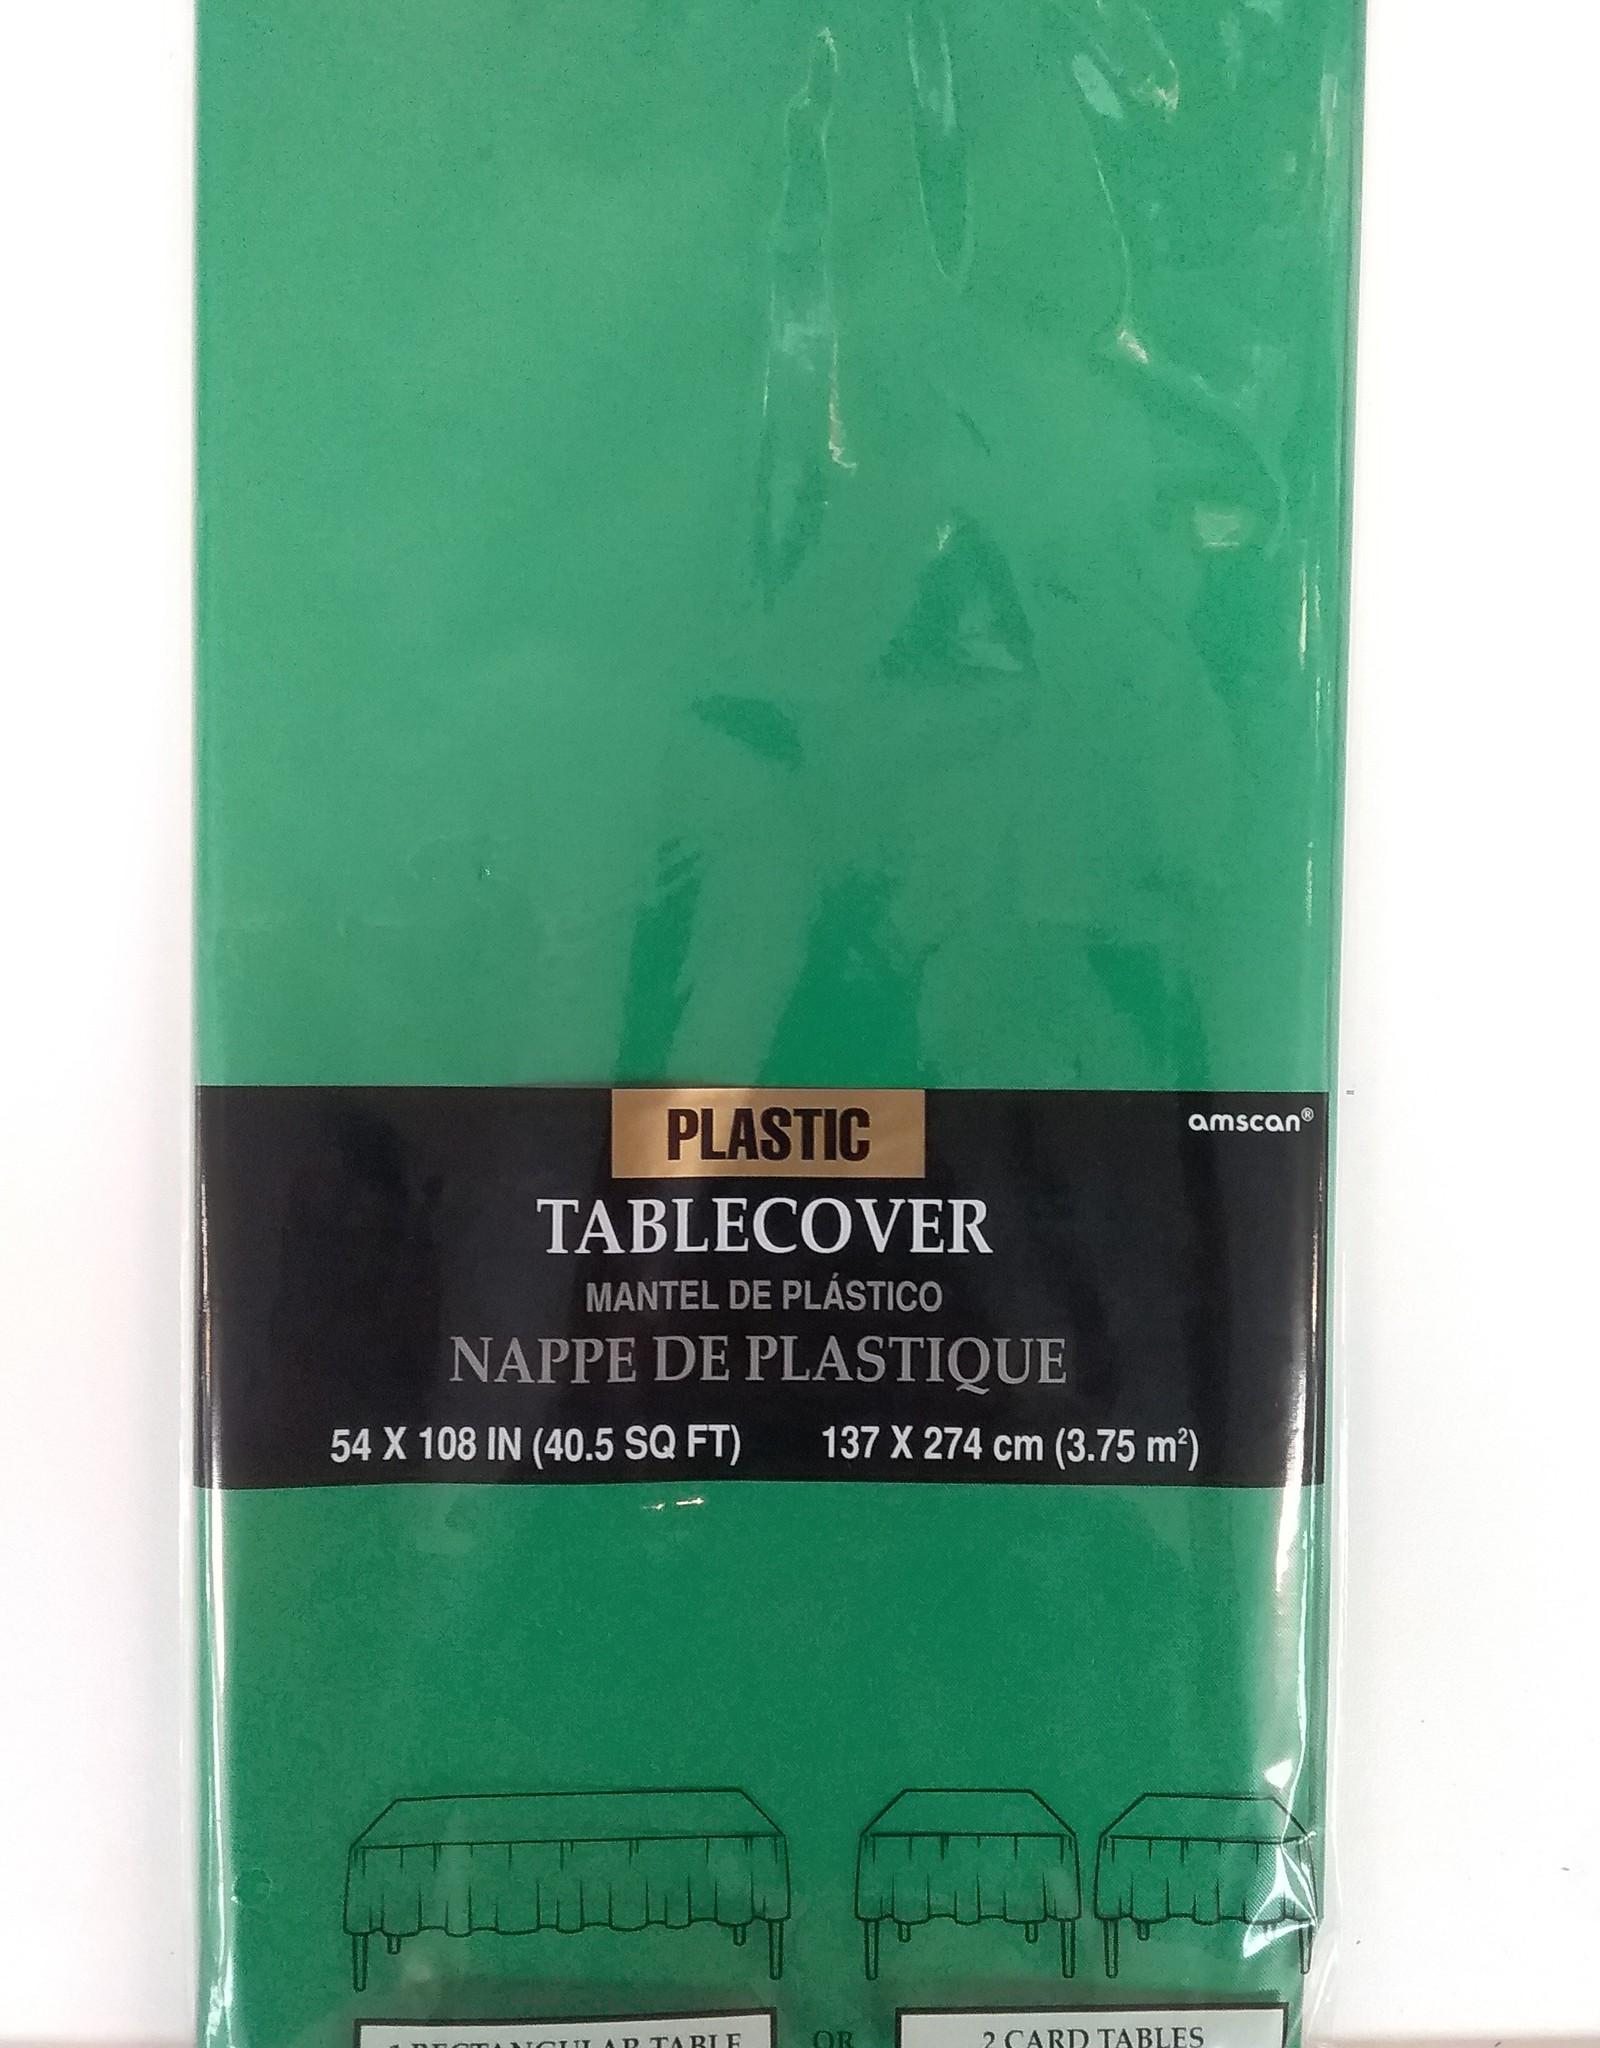 Festive Green Tablecover 54x108